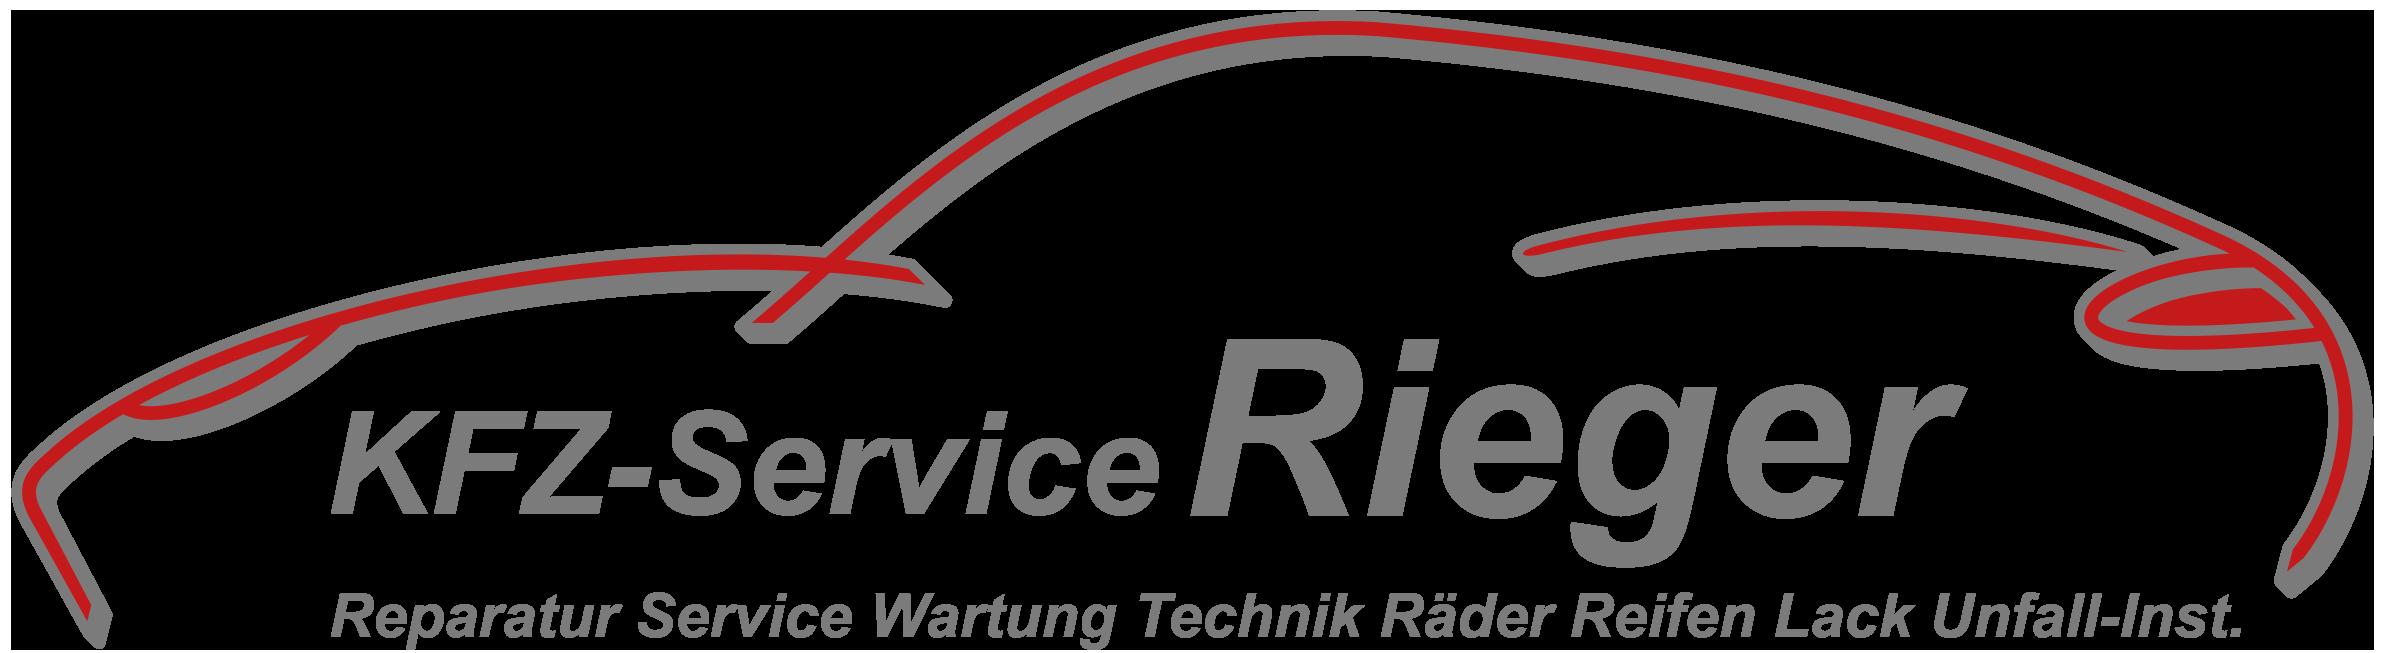 KFZ Service Rieger